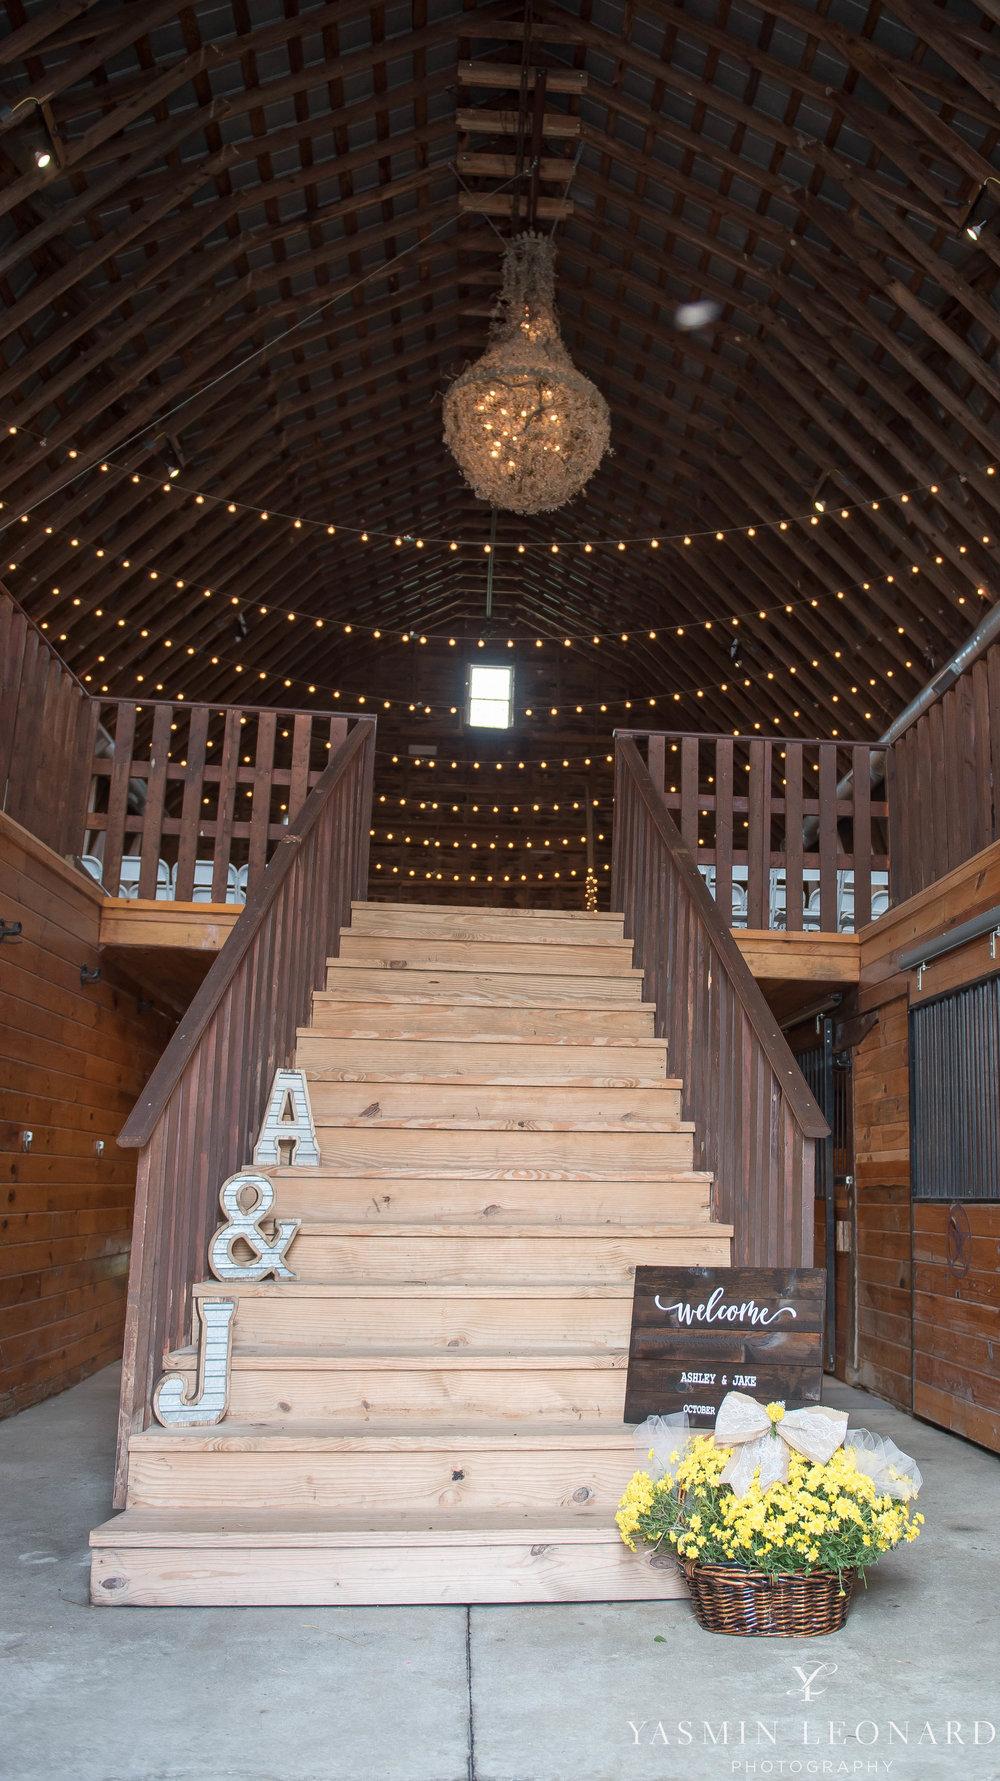 Millikan Farms - NC Wedding Venue - NC Wedding Photographer - Yasmin Leonard Photography - Rain on your wedding day-13.jpg